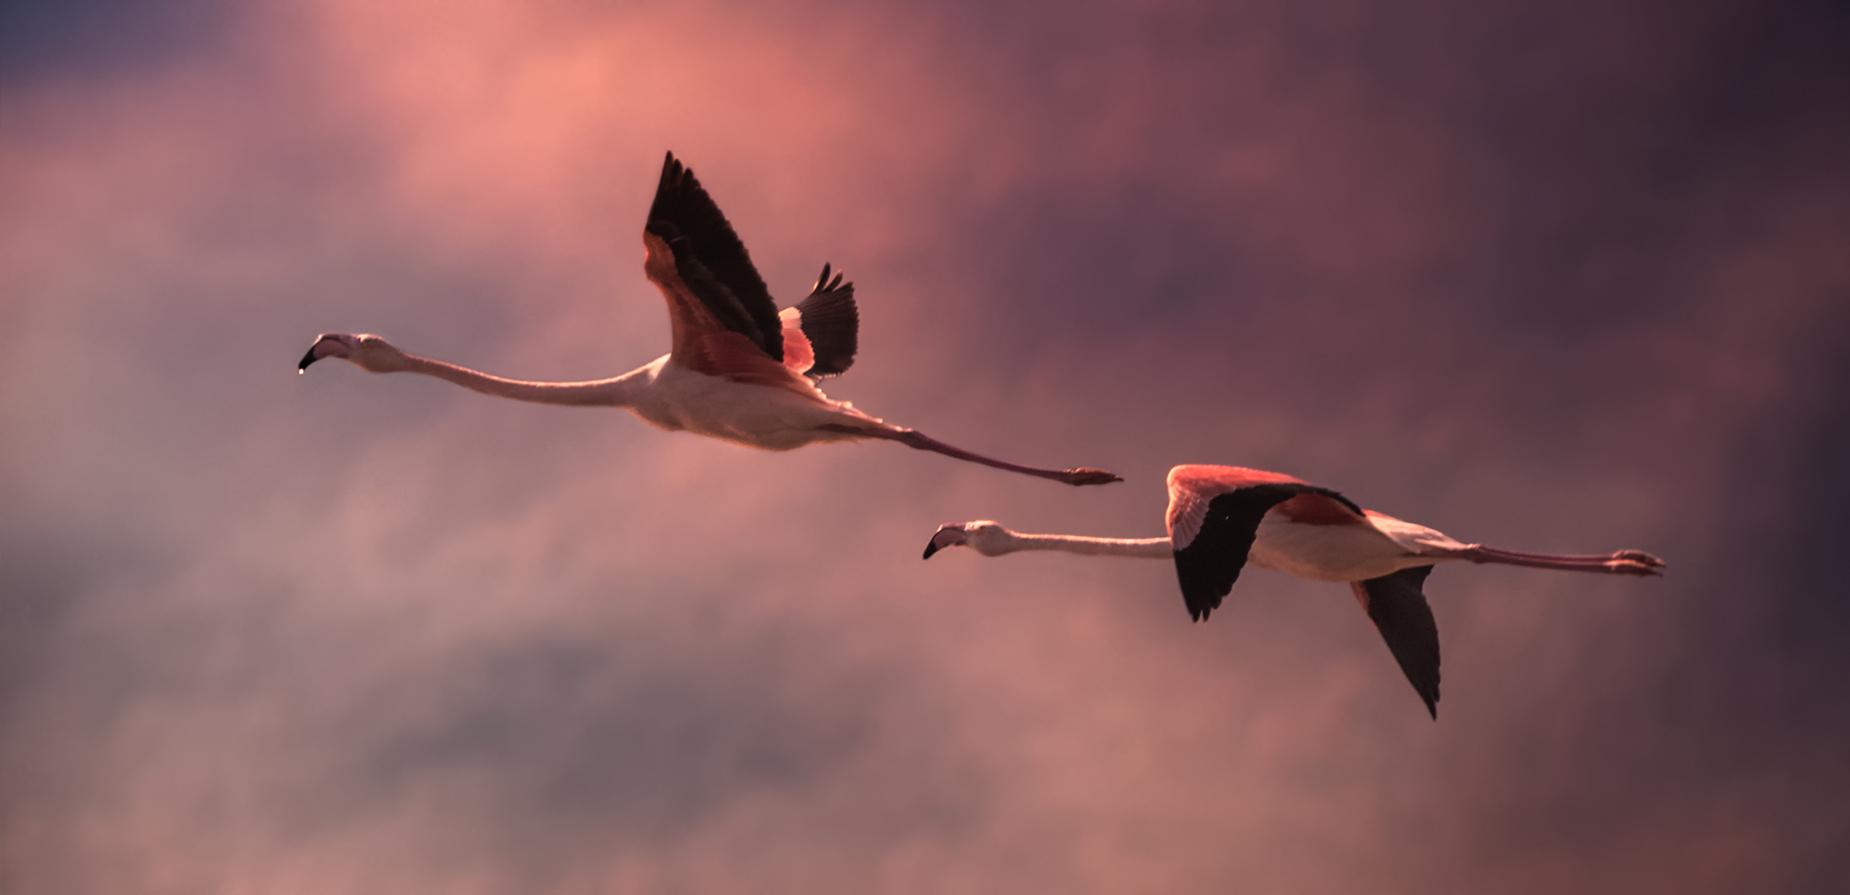 Photo in Wild life | Author kdlaz | PHOTO FORUM